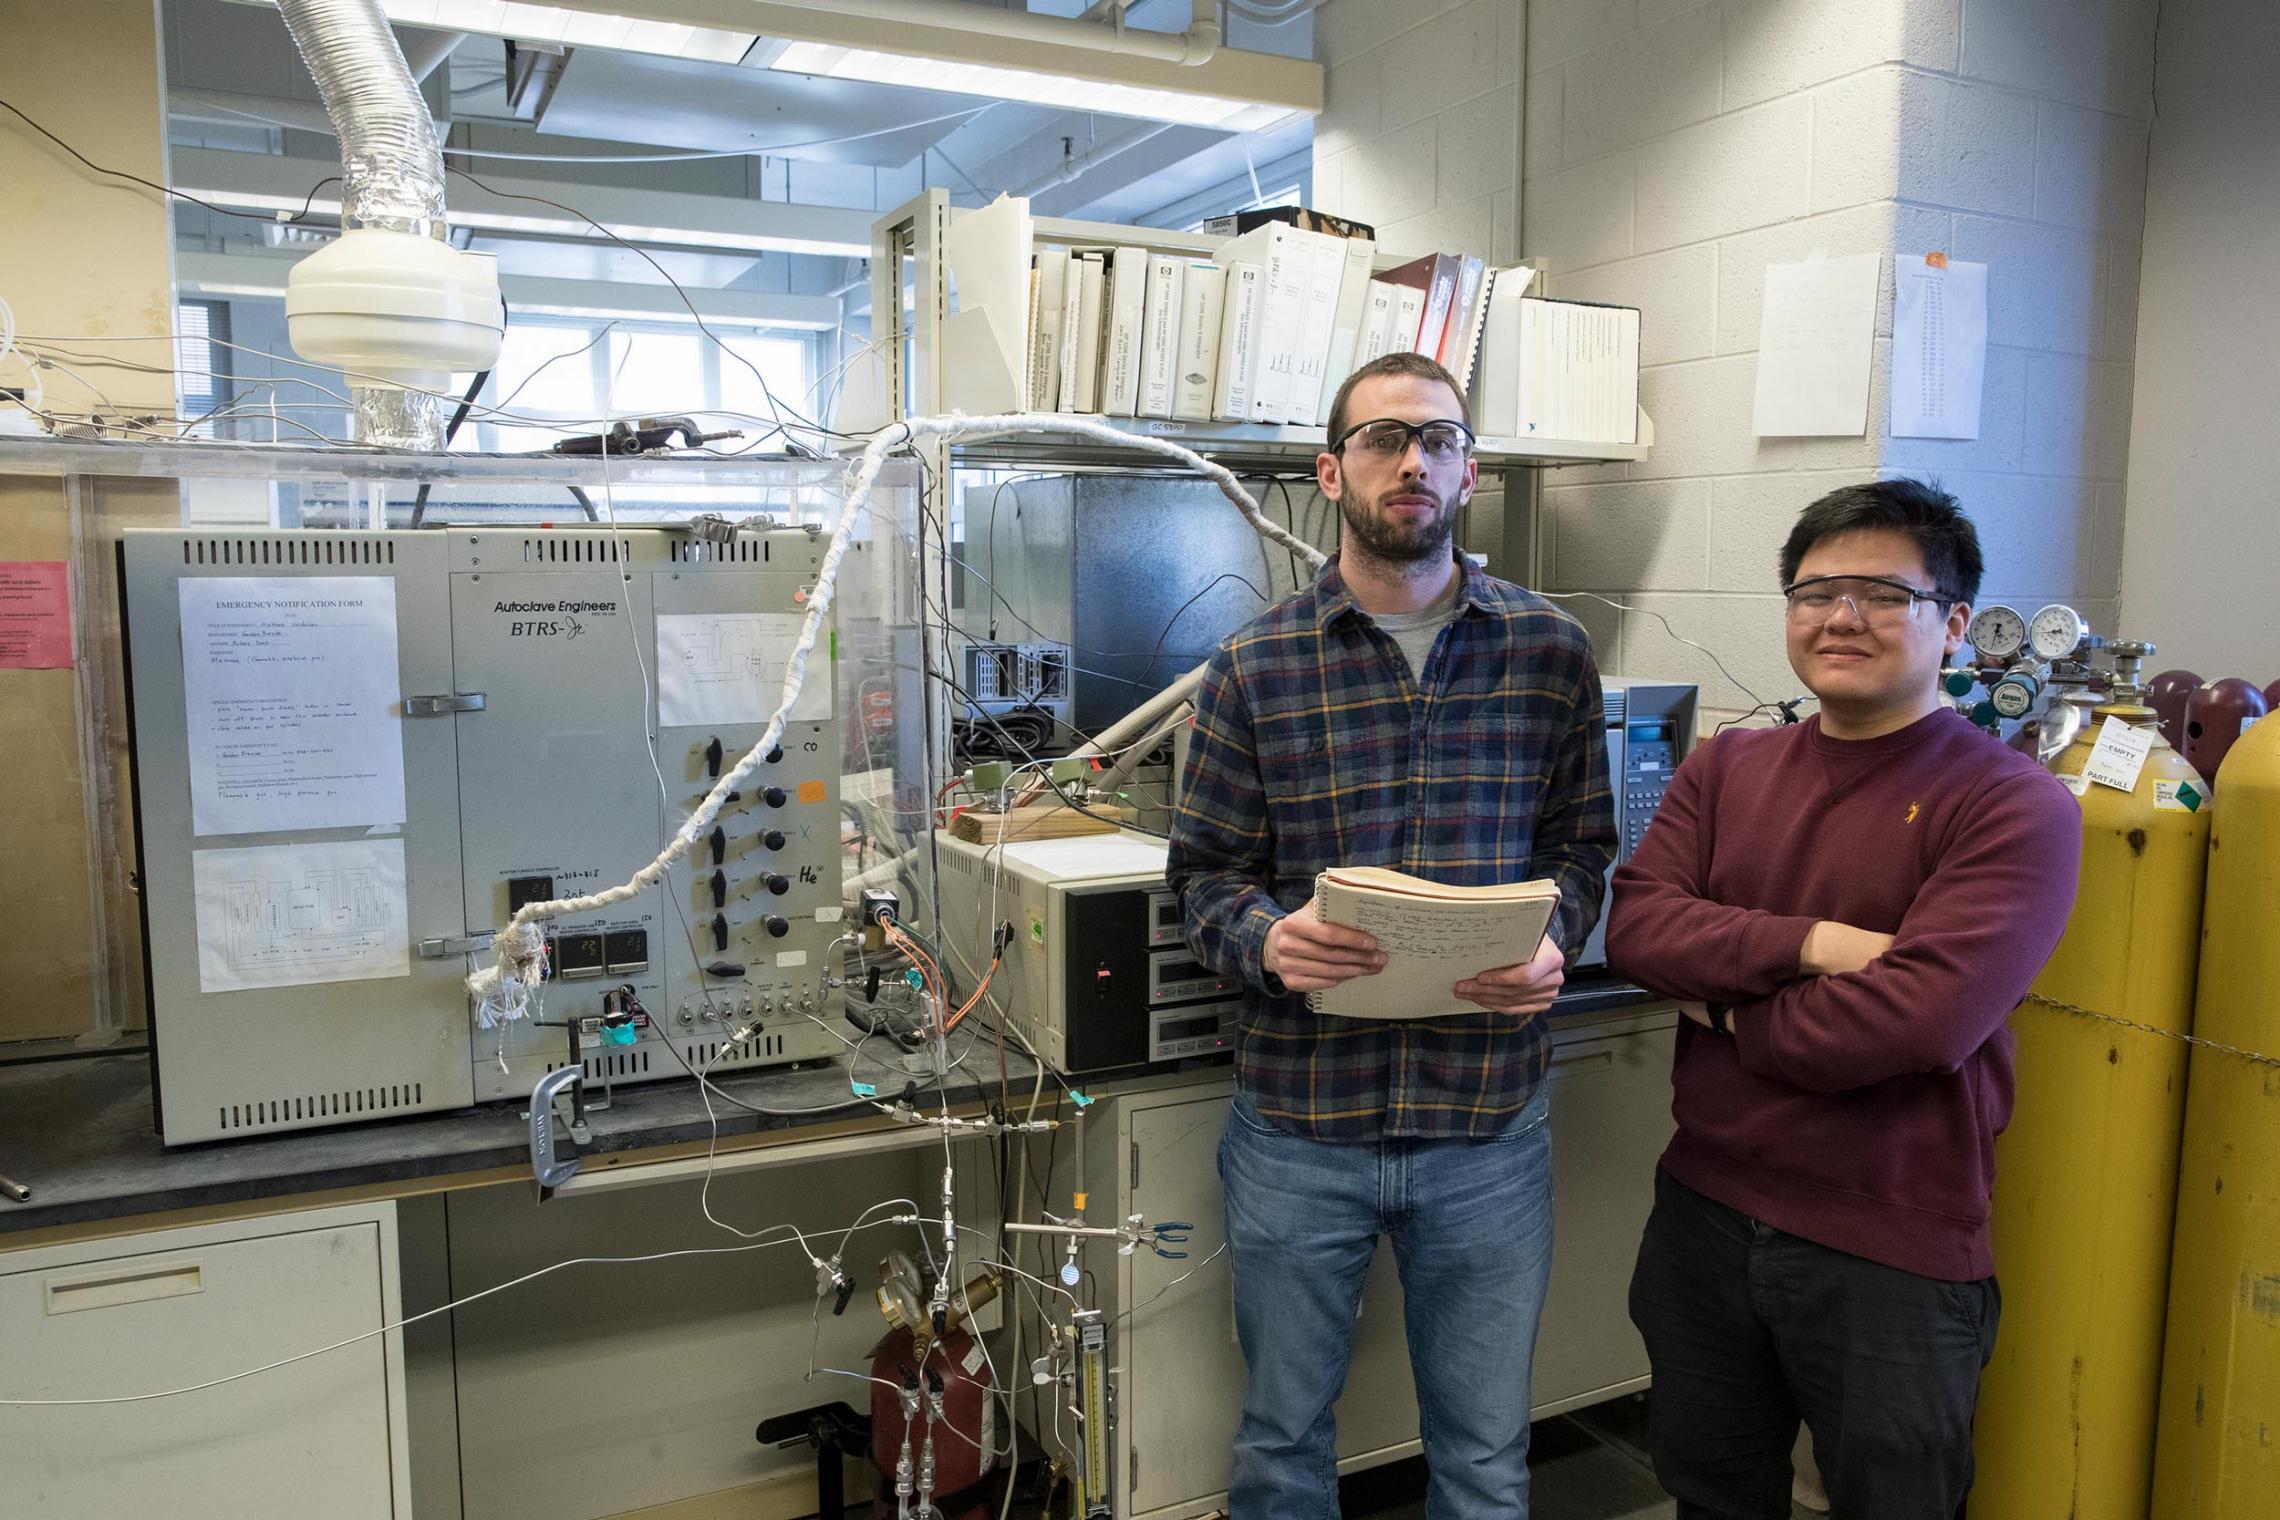 Double 'Hoo researchers Gordon Brezicki, left, and Jonathan Zheng are seeking a cheaper way to convert methane into methanol.